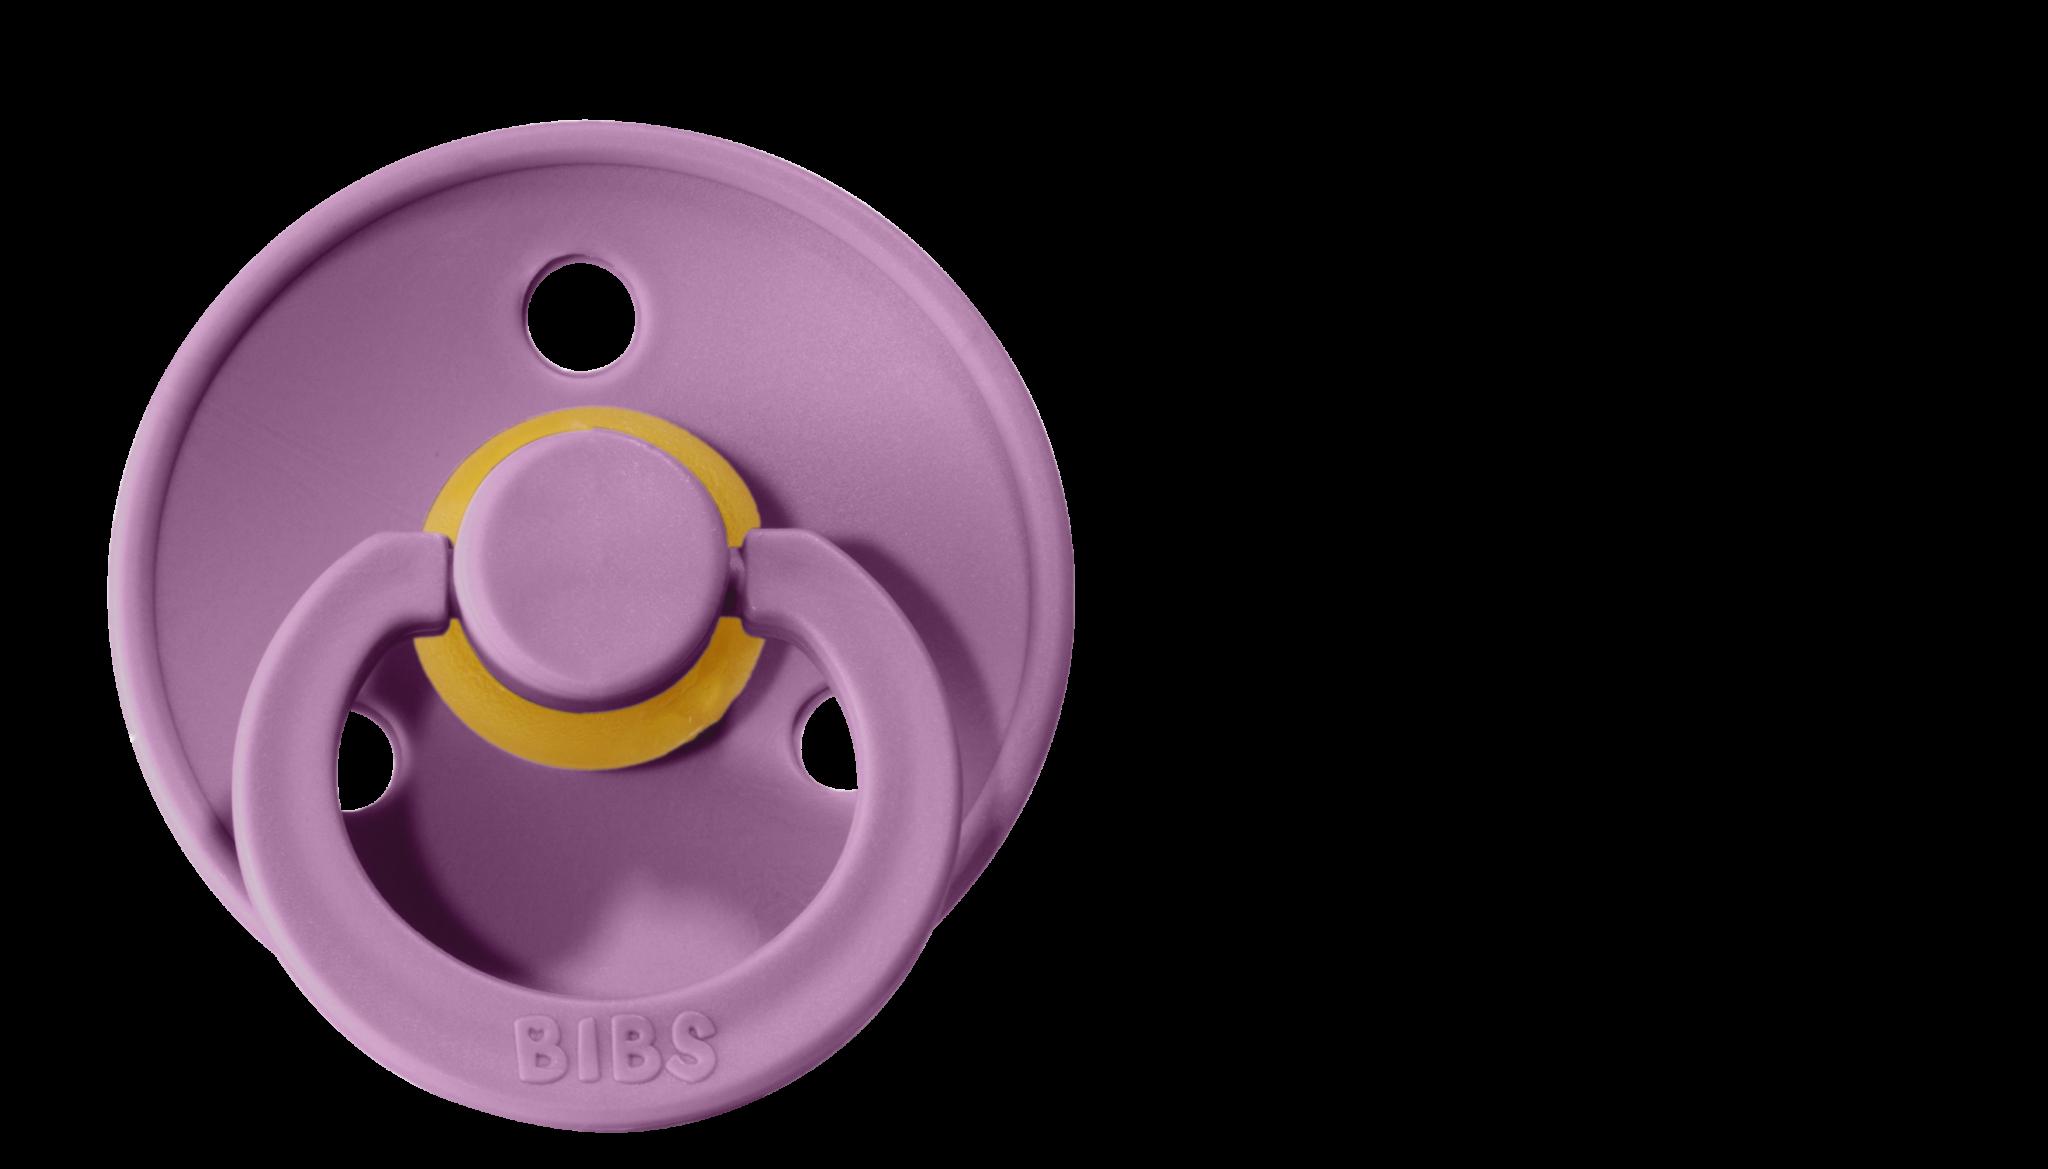 BIBS fopspeen +18M lavender-1